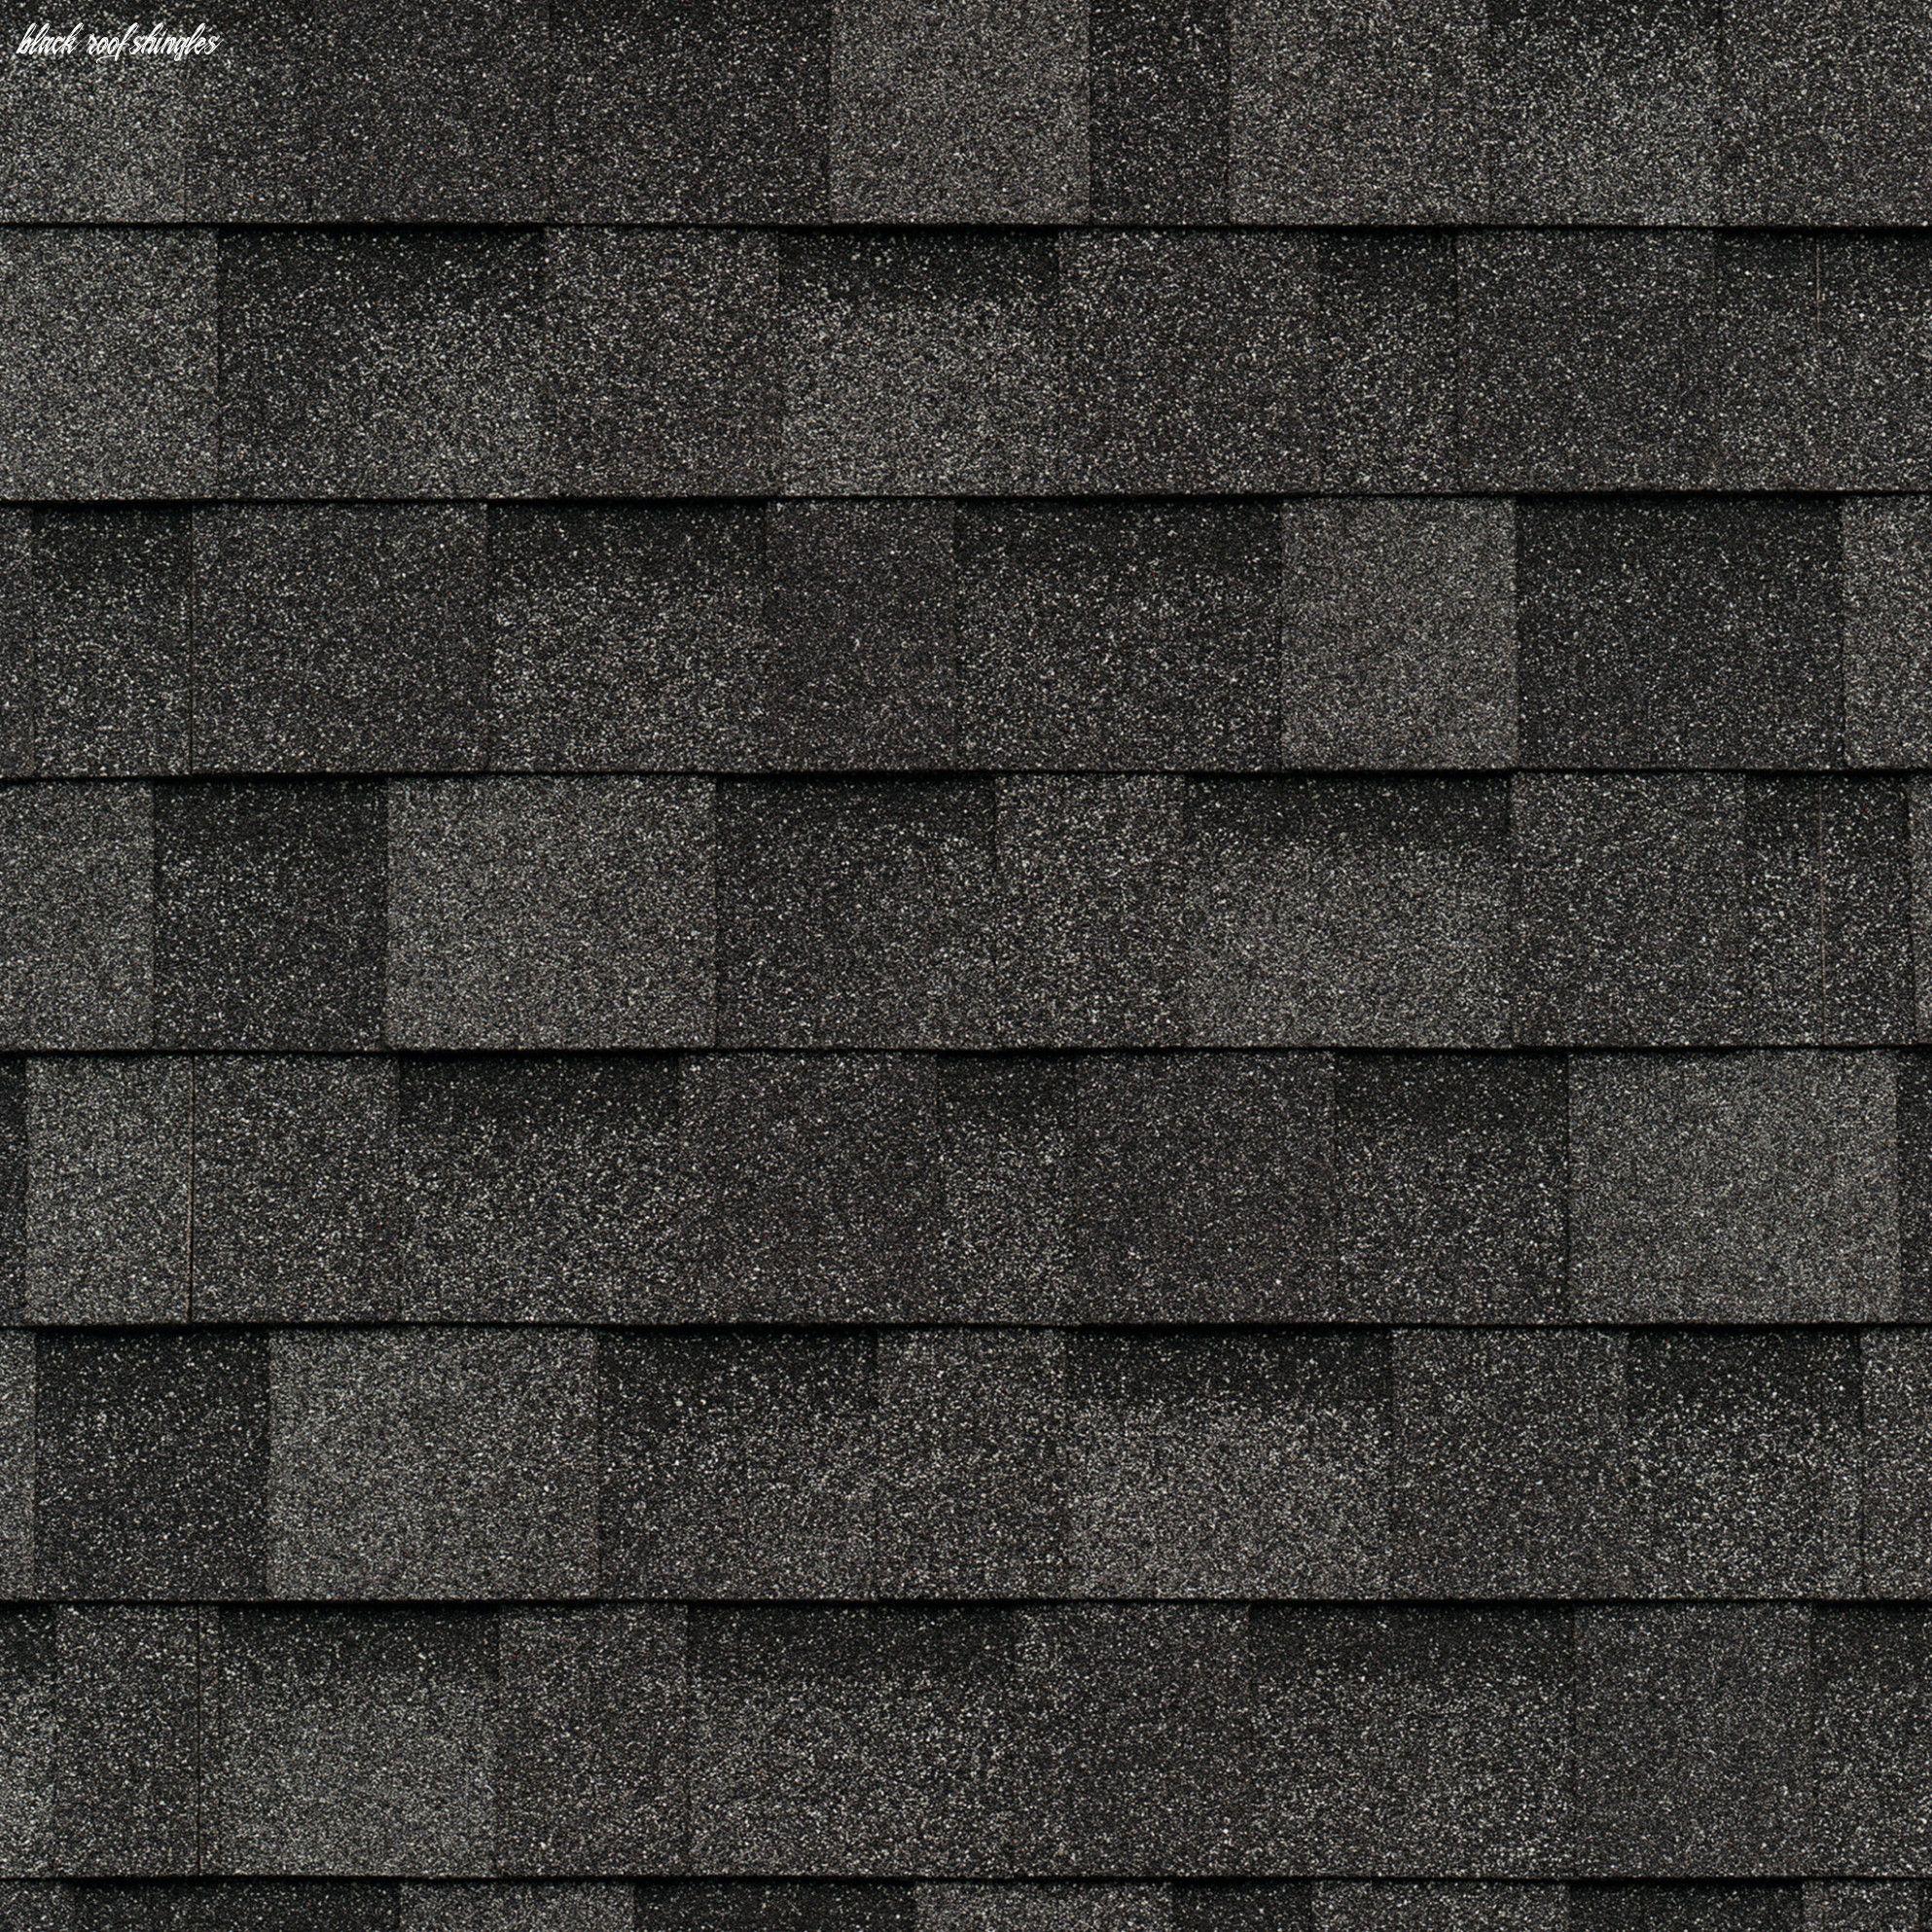 11 Black Roof Shingles In 2020 Roof Shingles Shingling Roof